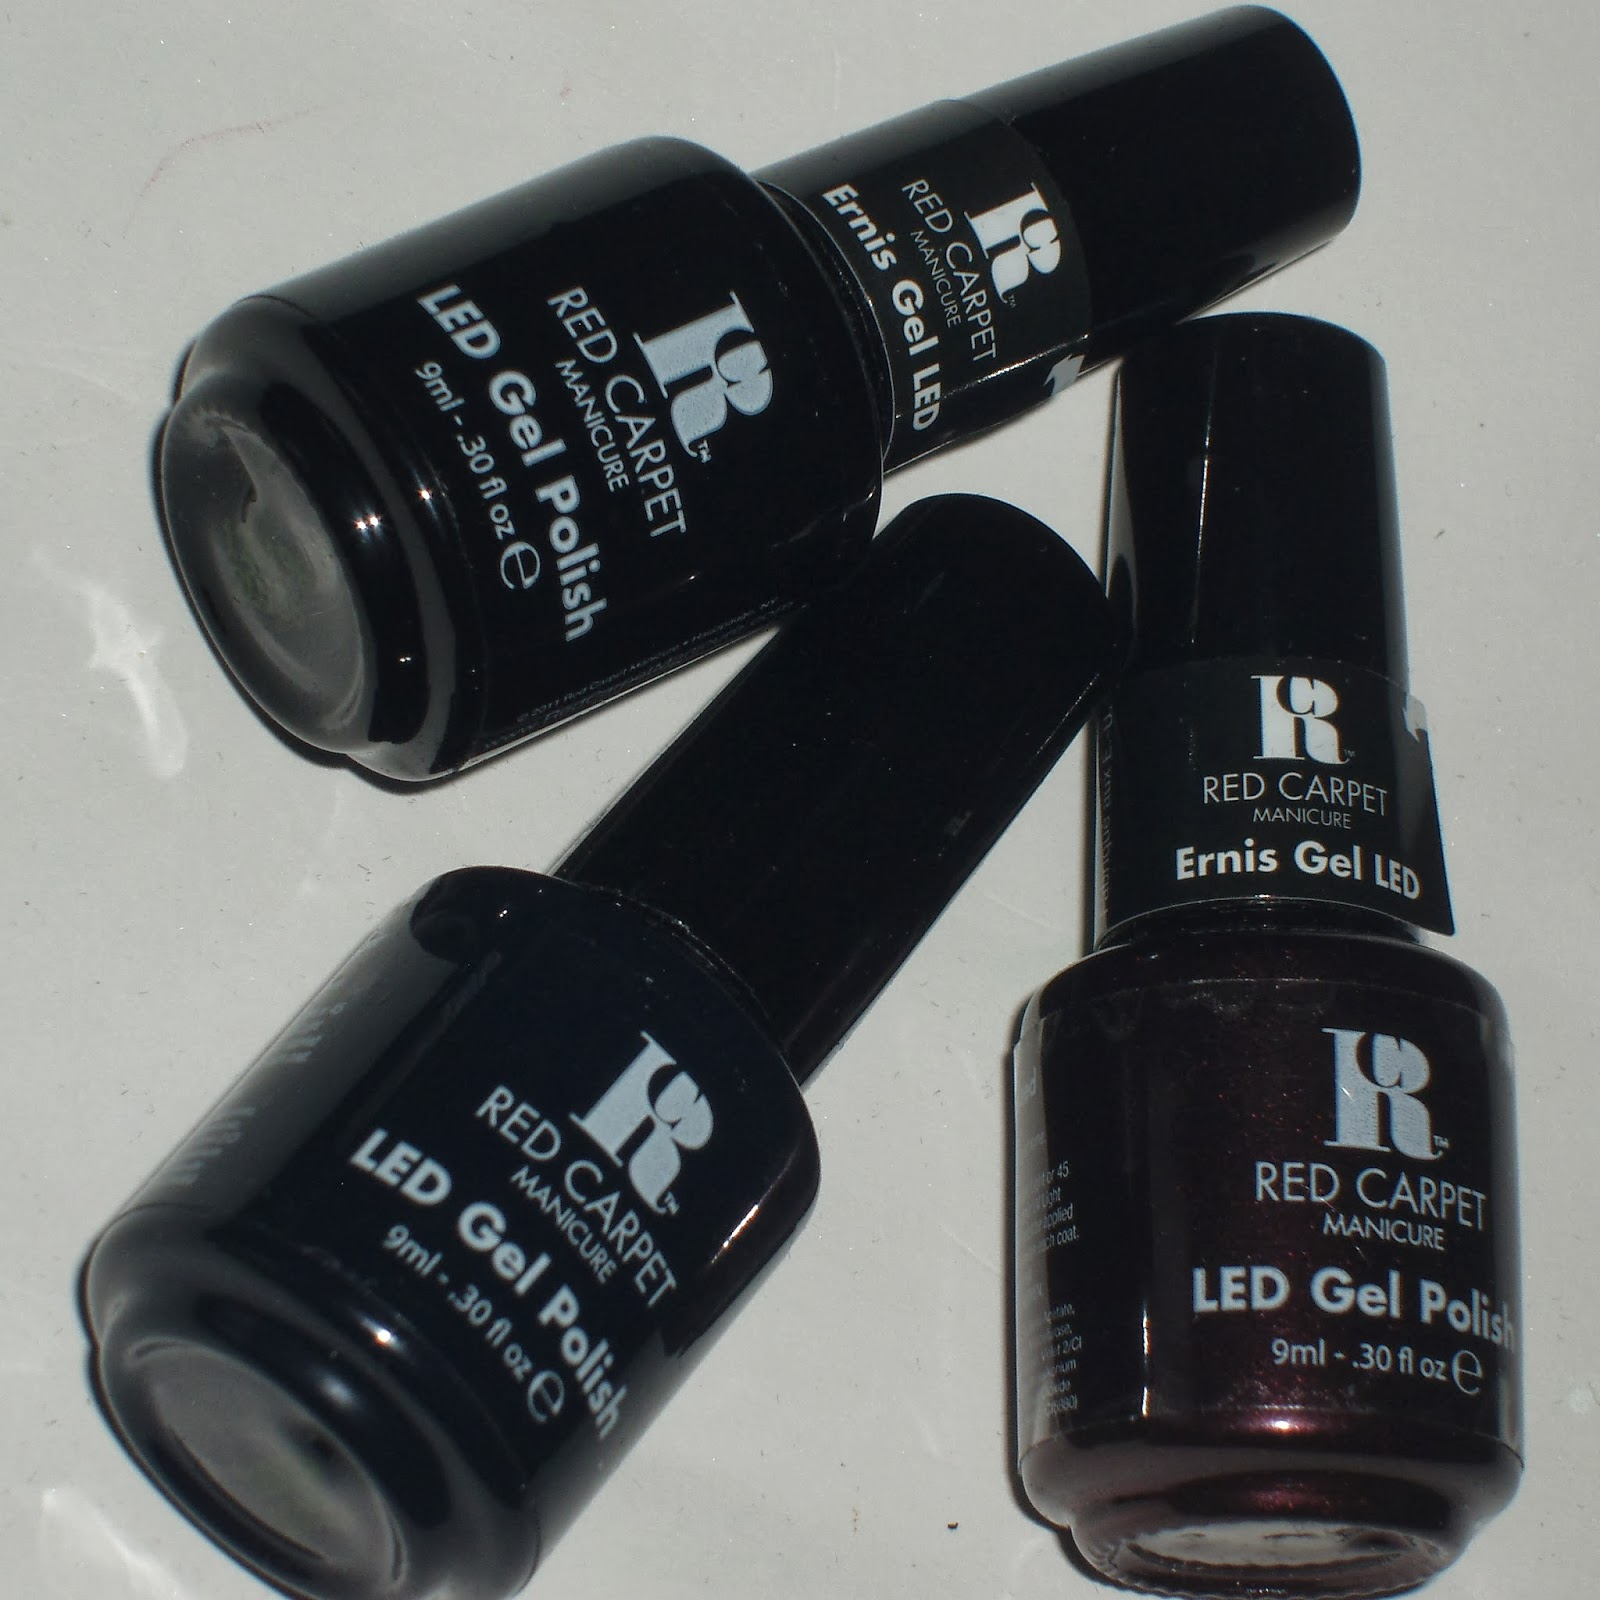 Sparkled Beauty Red Carpet Manicure Led Gel Mani